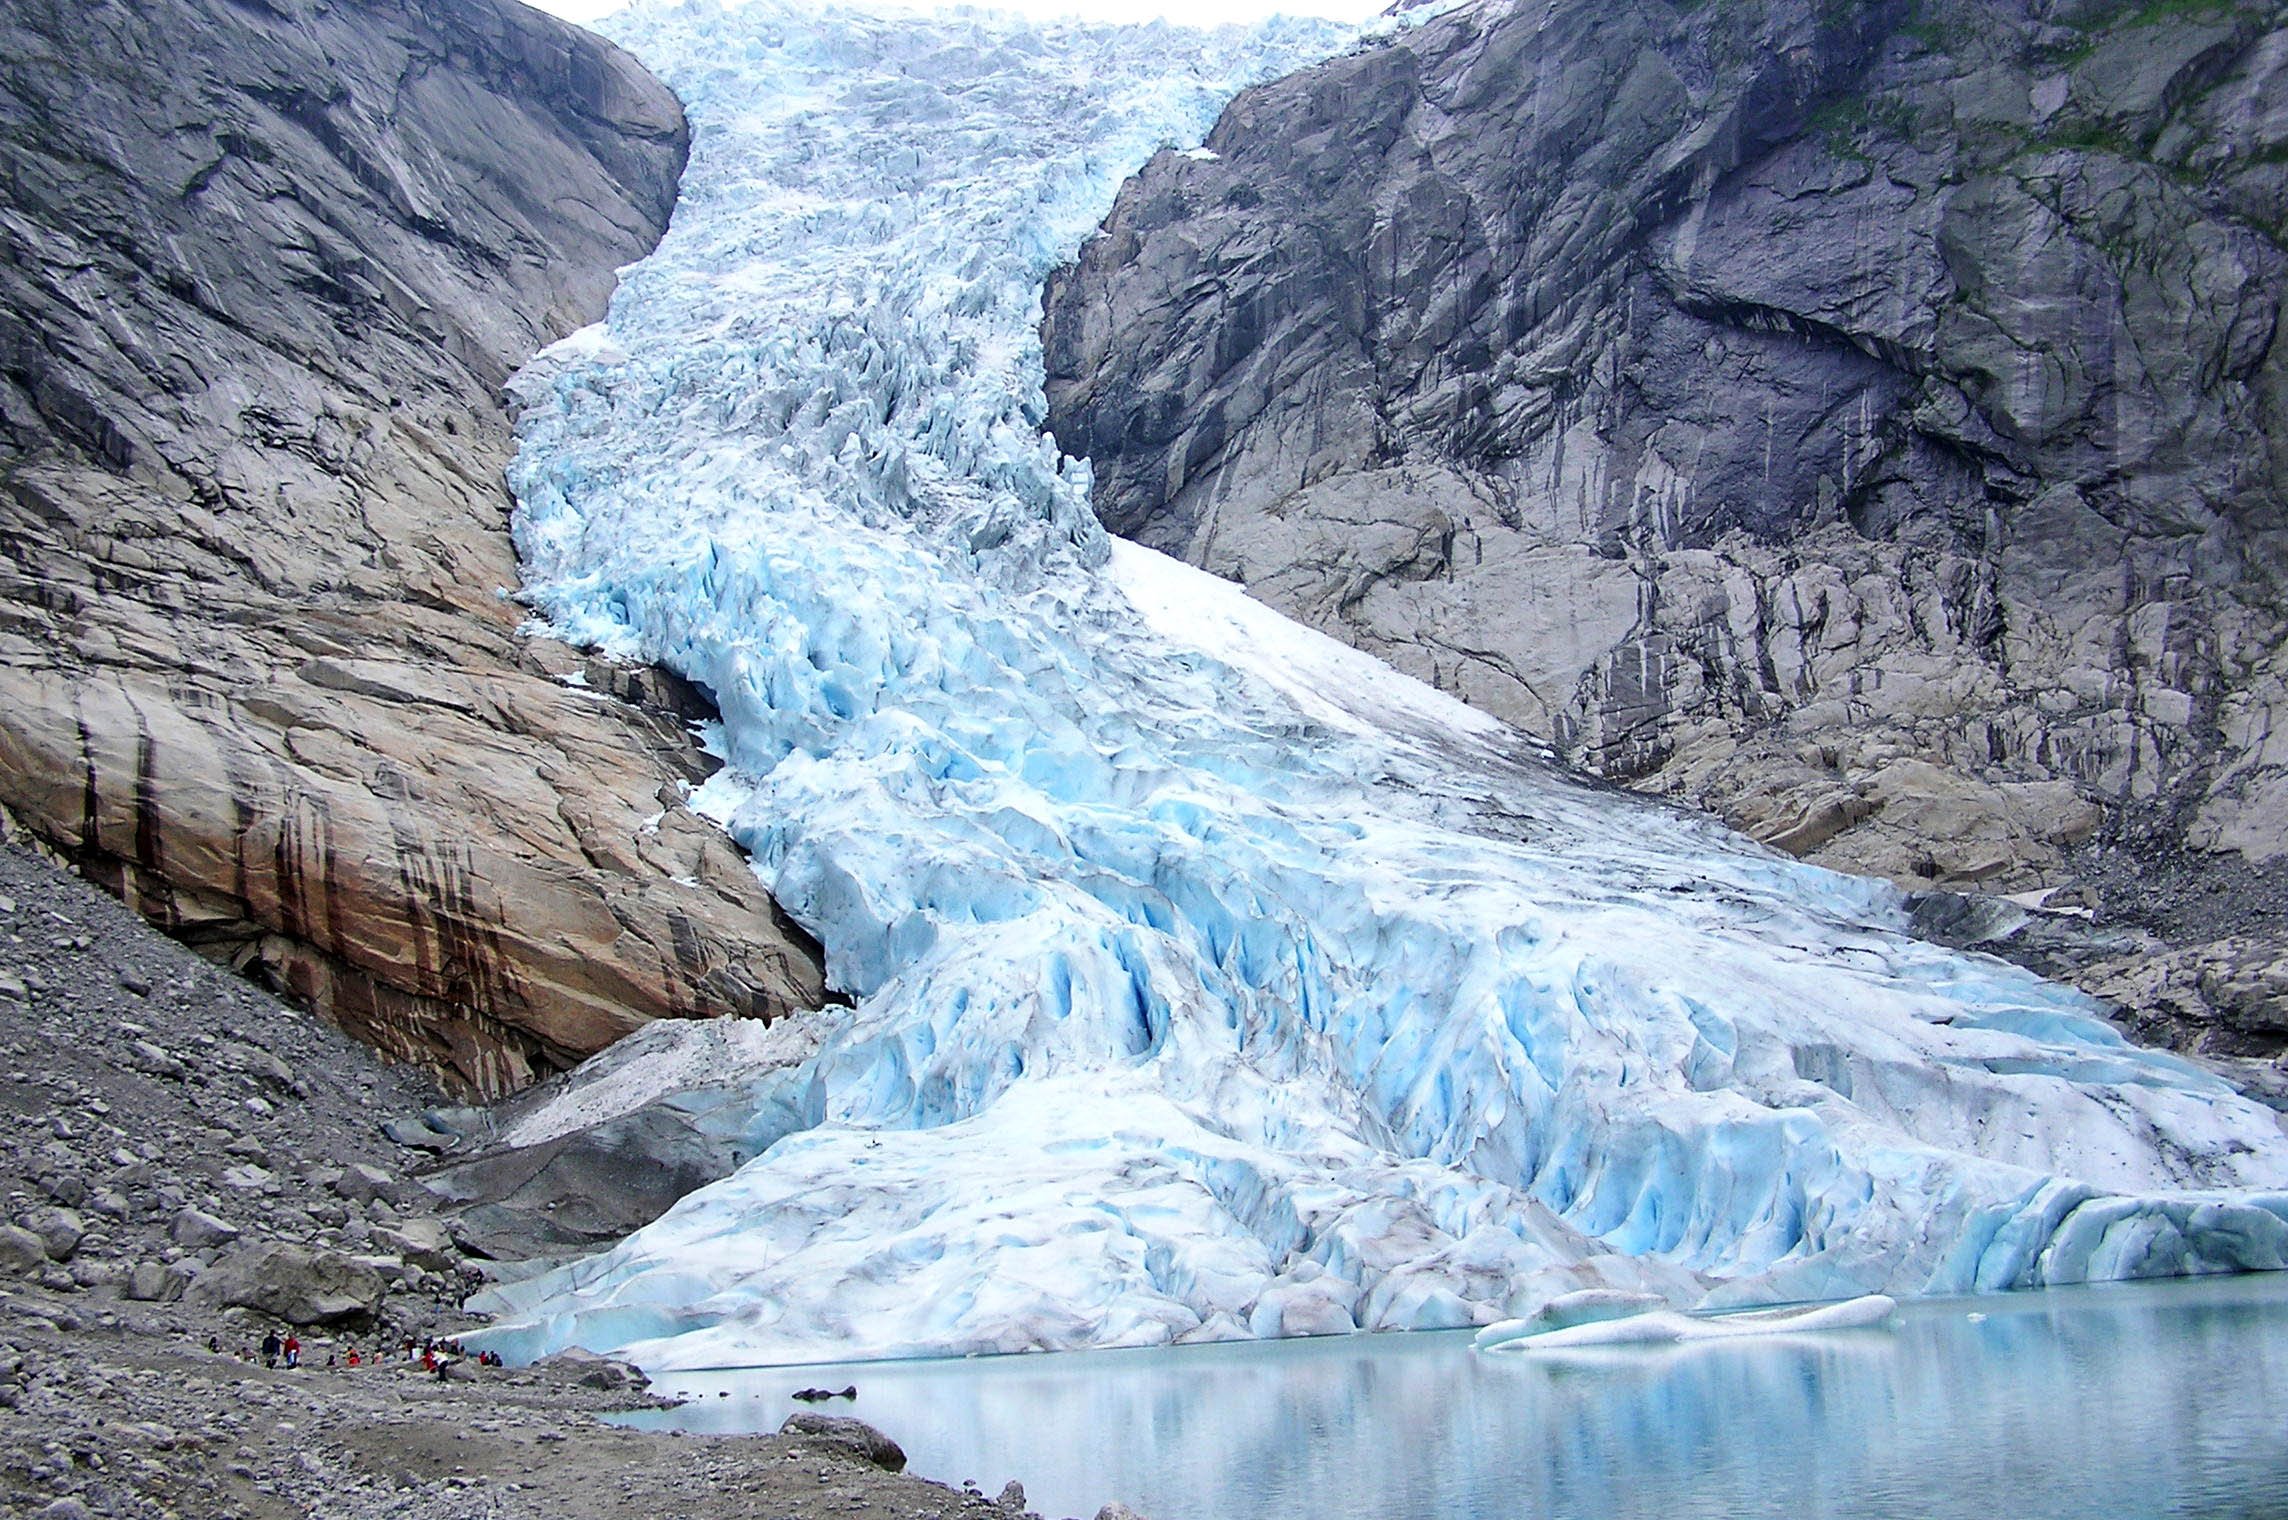 Depiction of Glaciar